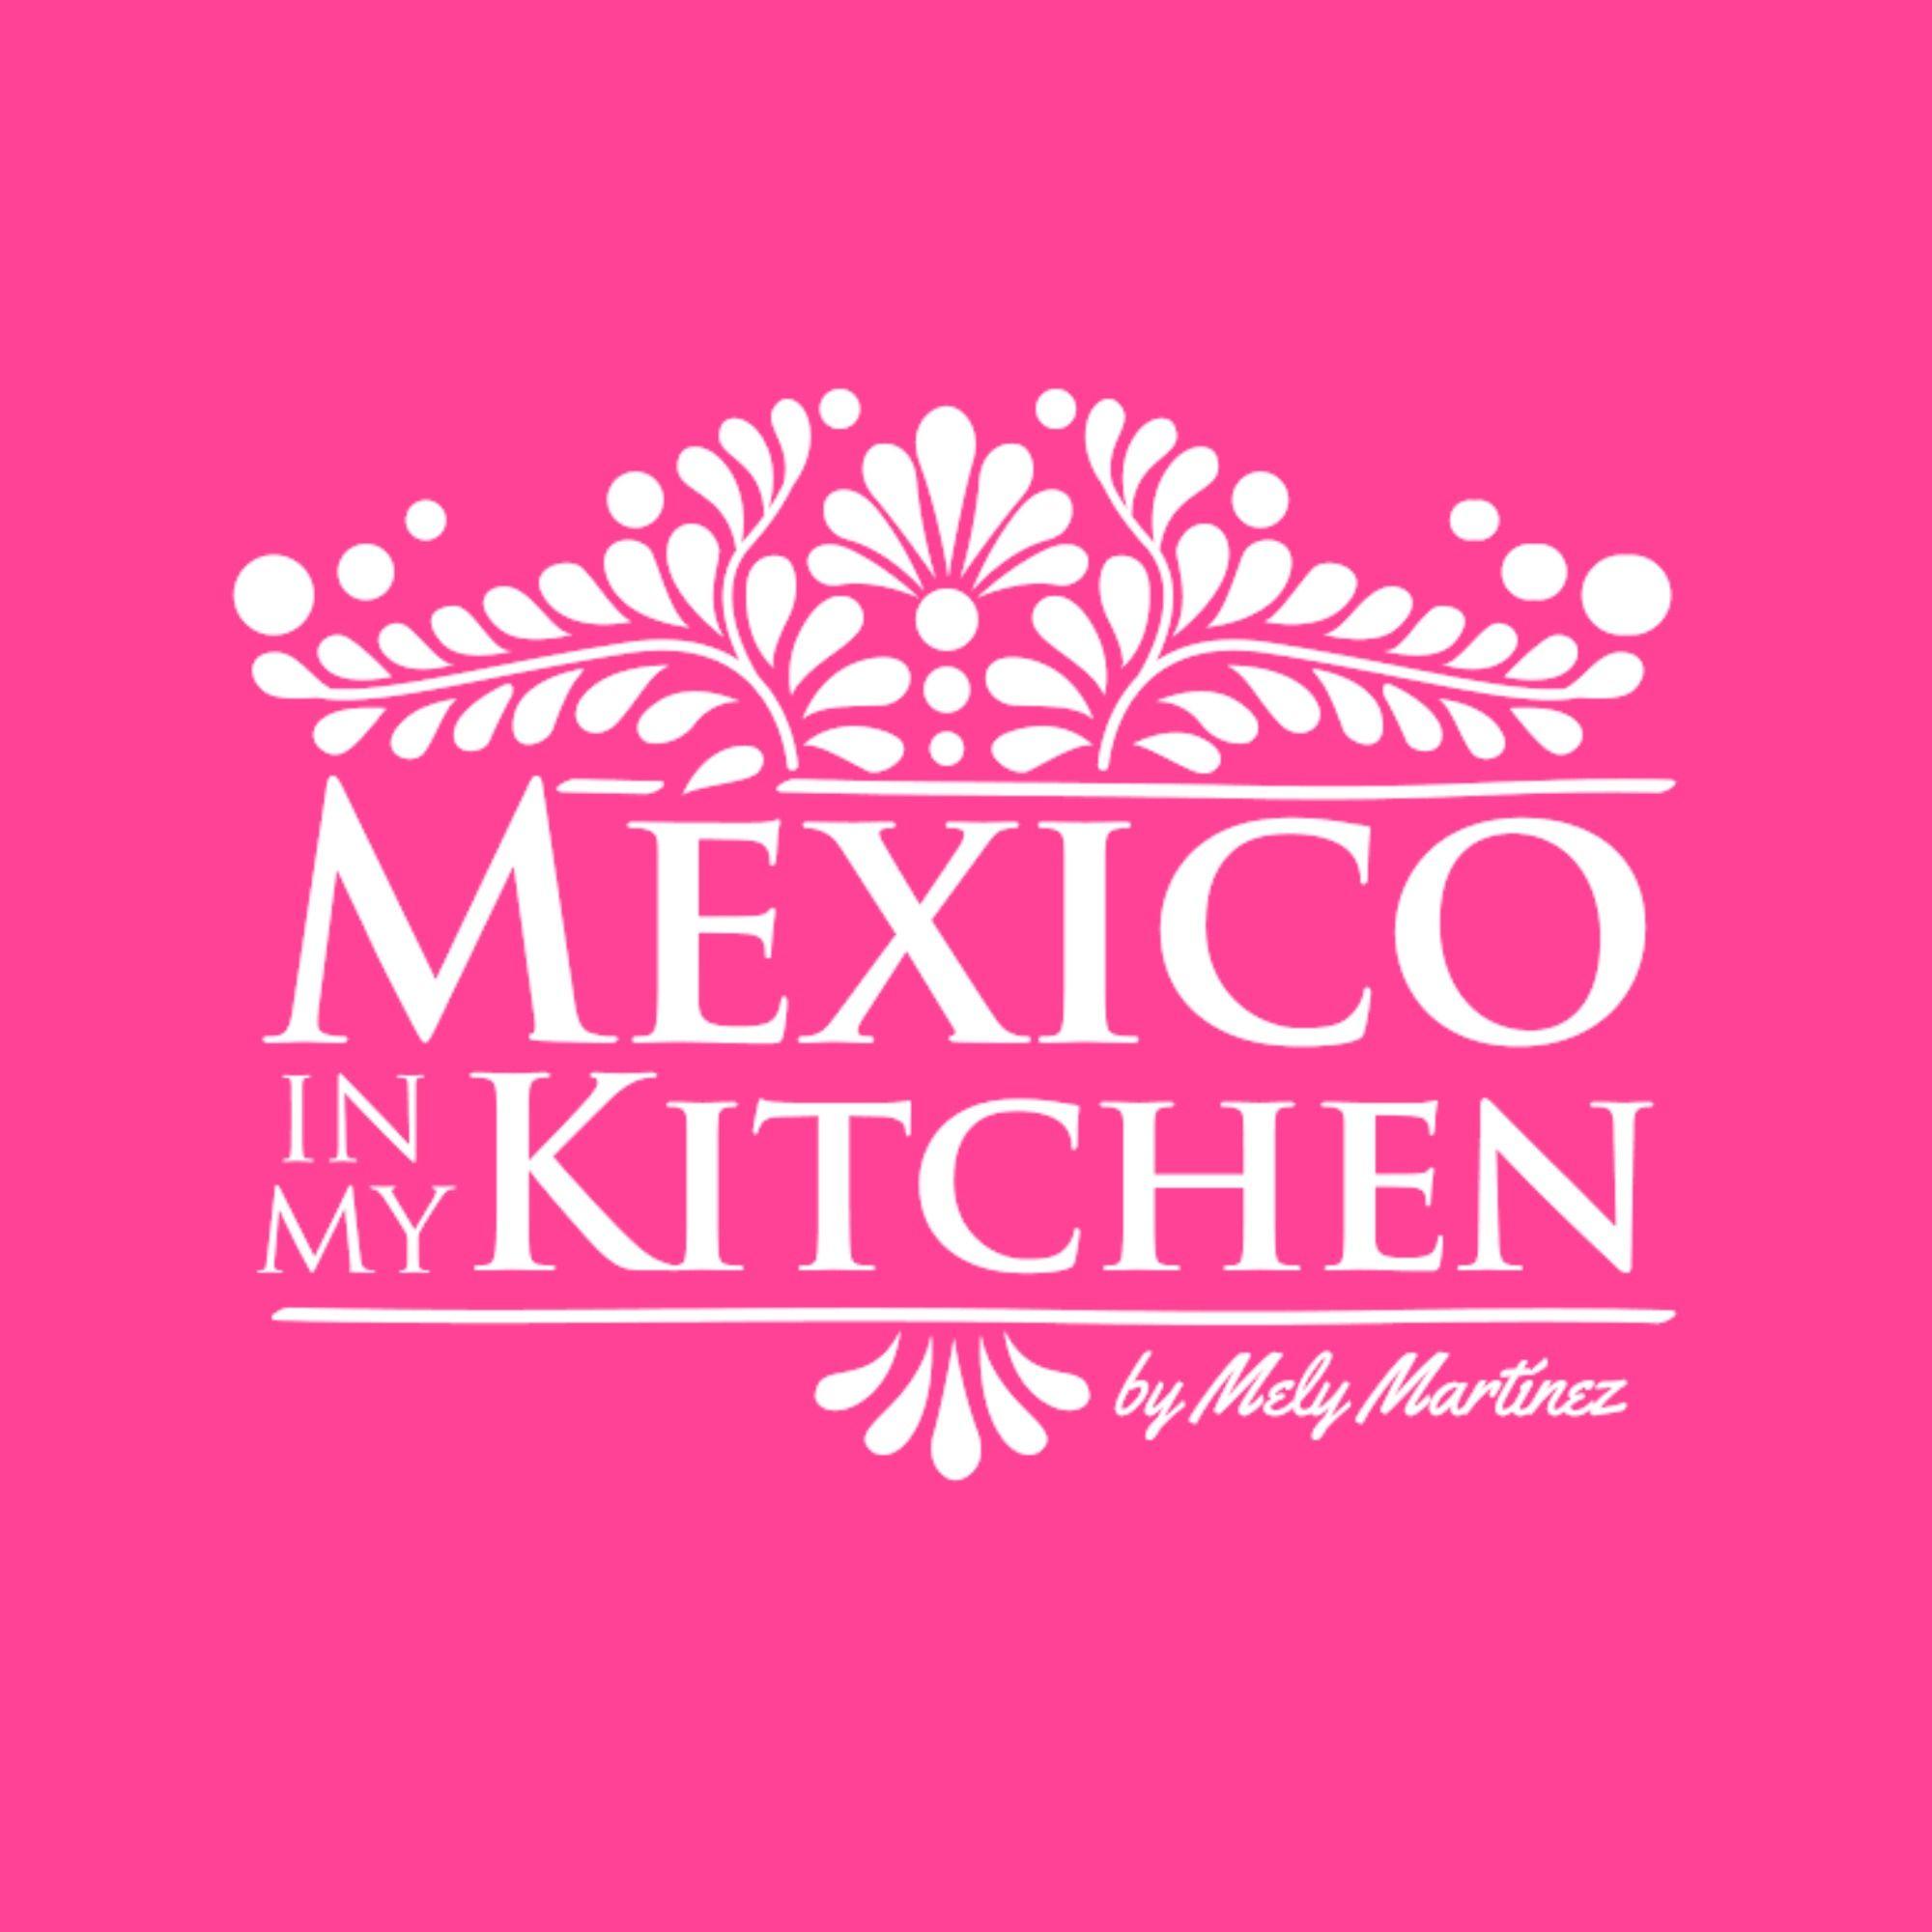 Mexico in My Kitchen: How to Make Mole Poblano / Cmo